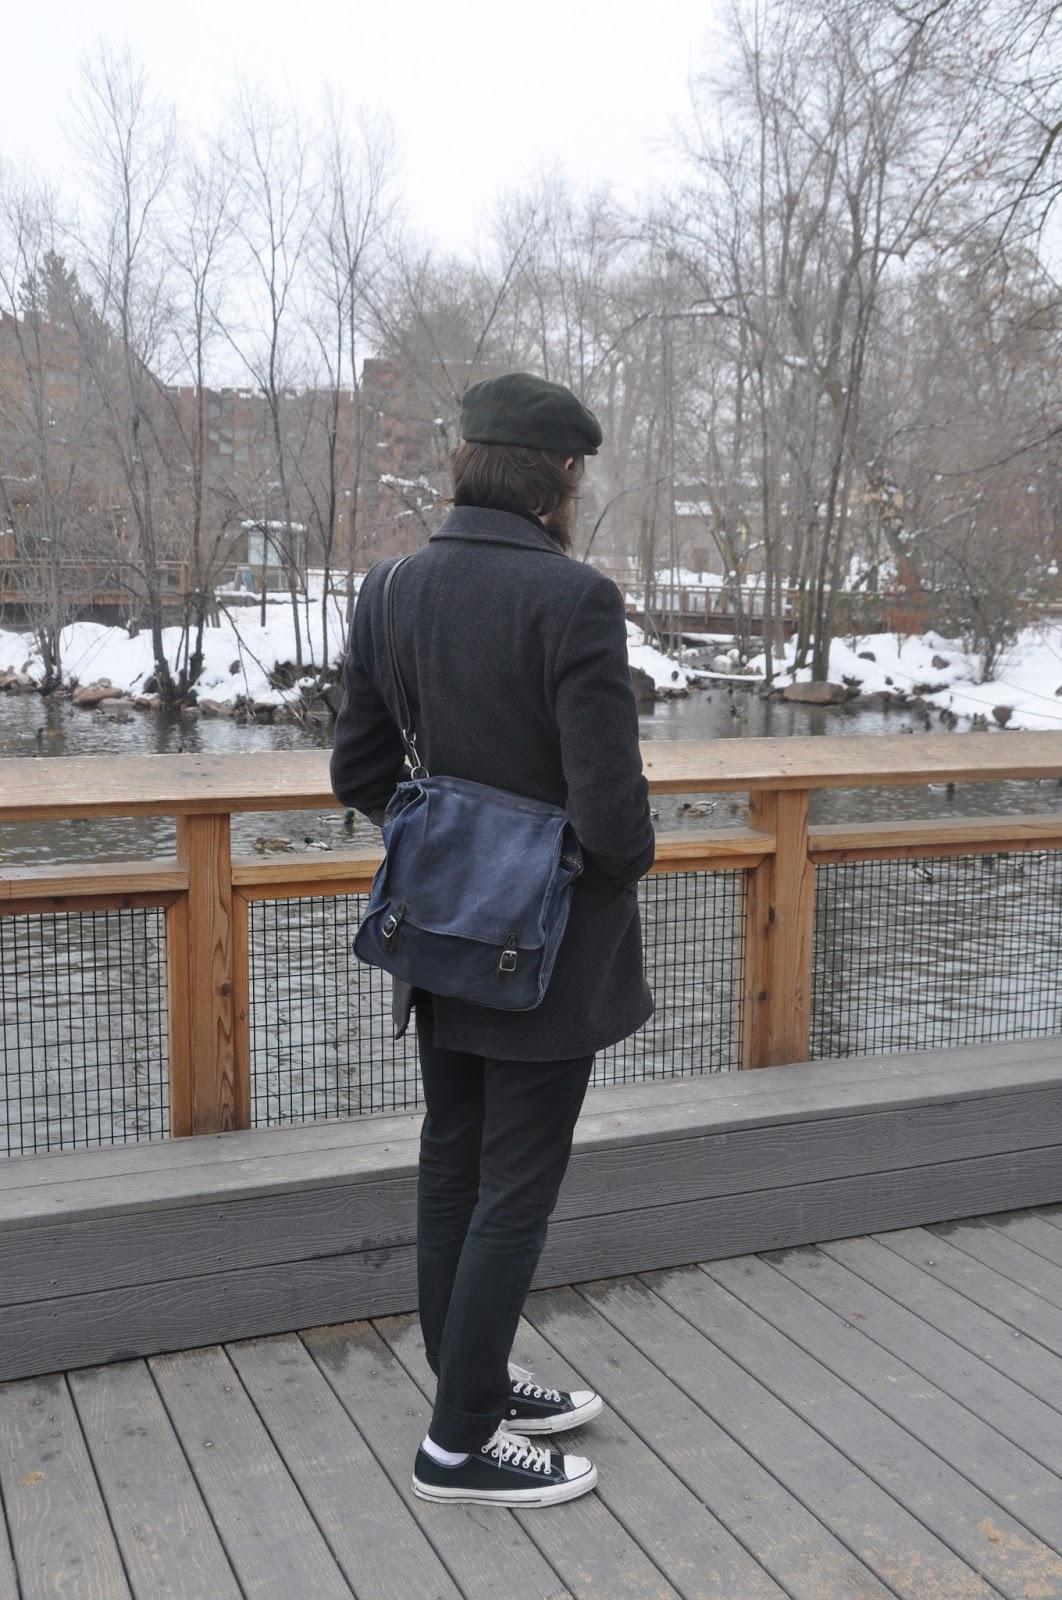 tracy aviary, aviary, birds, exotic birds, pelican feeding, pelican, liberty park, salt lake city, salt lake park, frozen park, ducks, duck pond, feeding ducks, fashion blog, fashion blogger, style blog, style blogger, mens fashion, mens fashion blog, mens style, mens style blog, womens style blog, anthropologie ootd blog, anthropologie ootd, anthropologie, ootd, mens ootd, womens ootd,